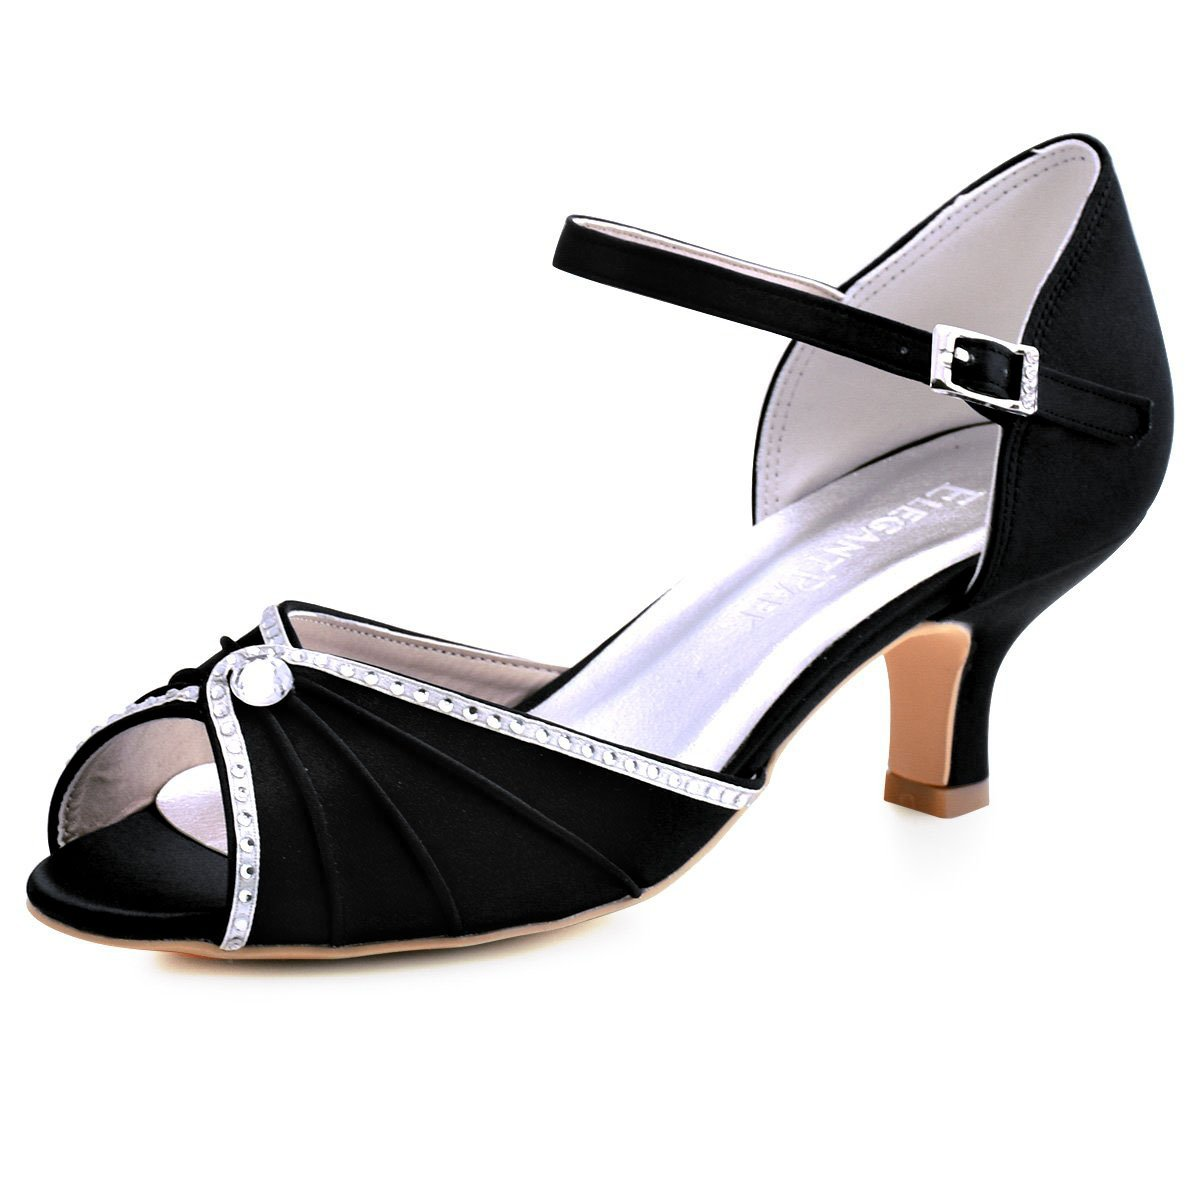 ElegantPark HP1623 Women's Sandals Peep Toe Mid Heel Pumps Pleated Rhinestones Satin Evening Wedding Party Shoes B076PTJQPS 6 B(M) US|Black